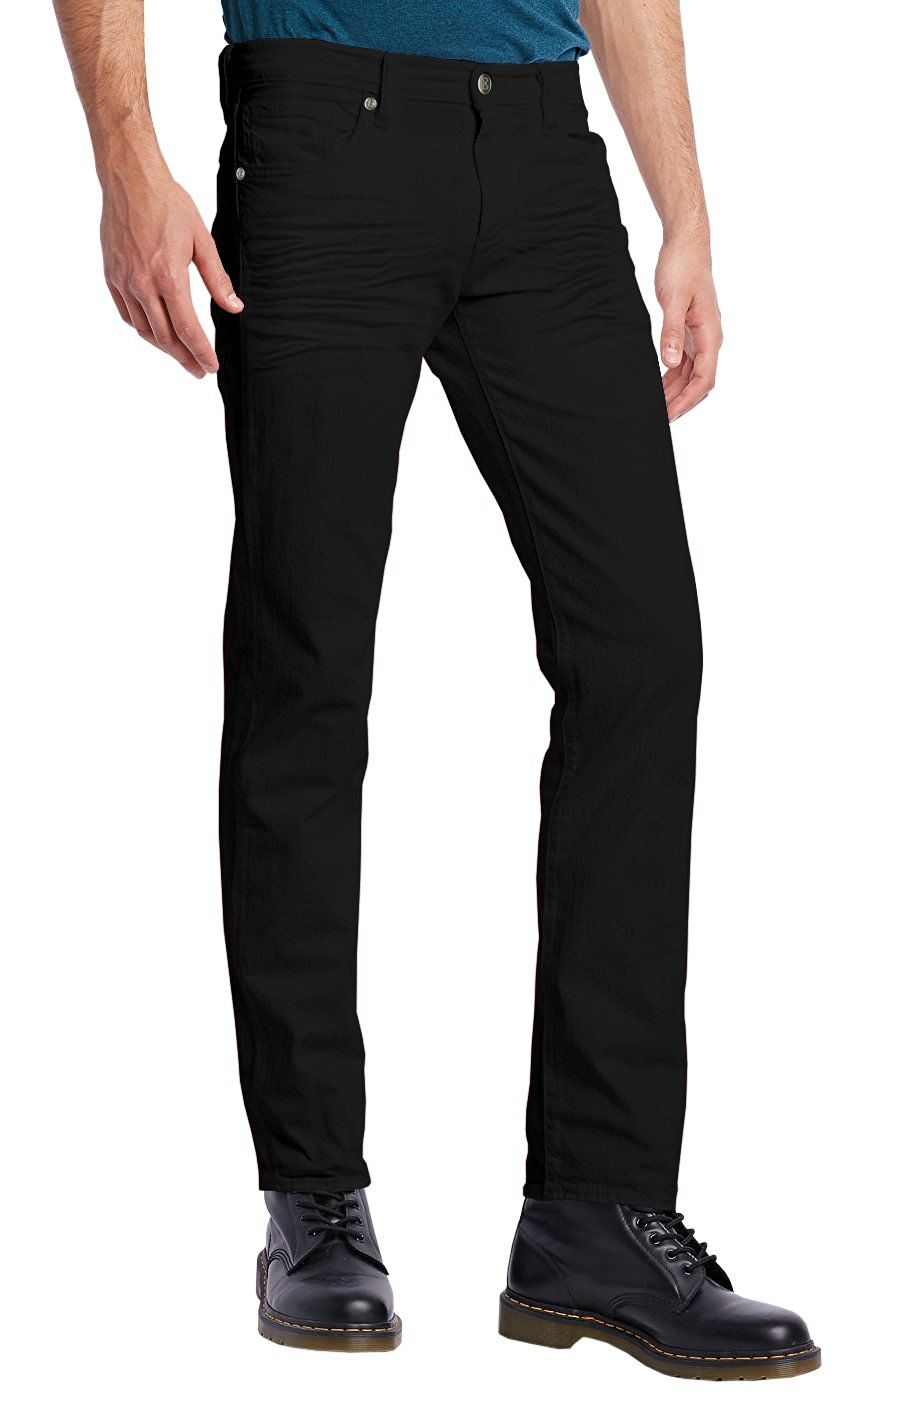 483f331c004 ETHANOL Mens Slim Stretch Motion Flex Denim Five Pocket Jean at Amazon  Men's Clothing store: